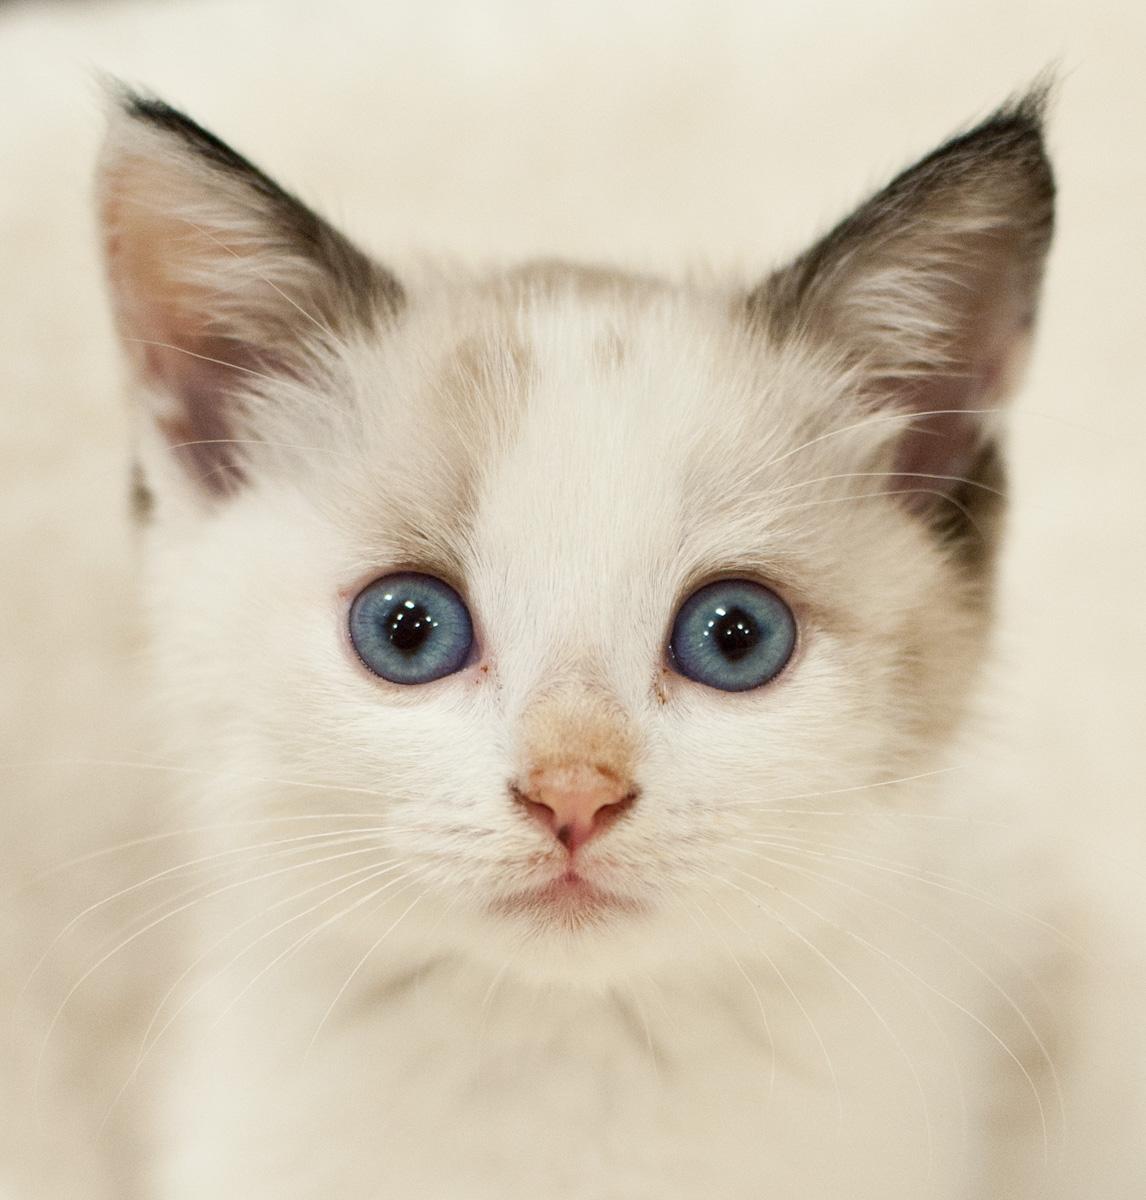 Discount Spay/Neuter   VSA Animal Rescue - Adoption - Foster